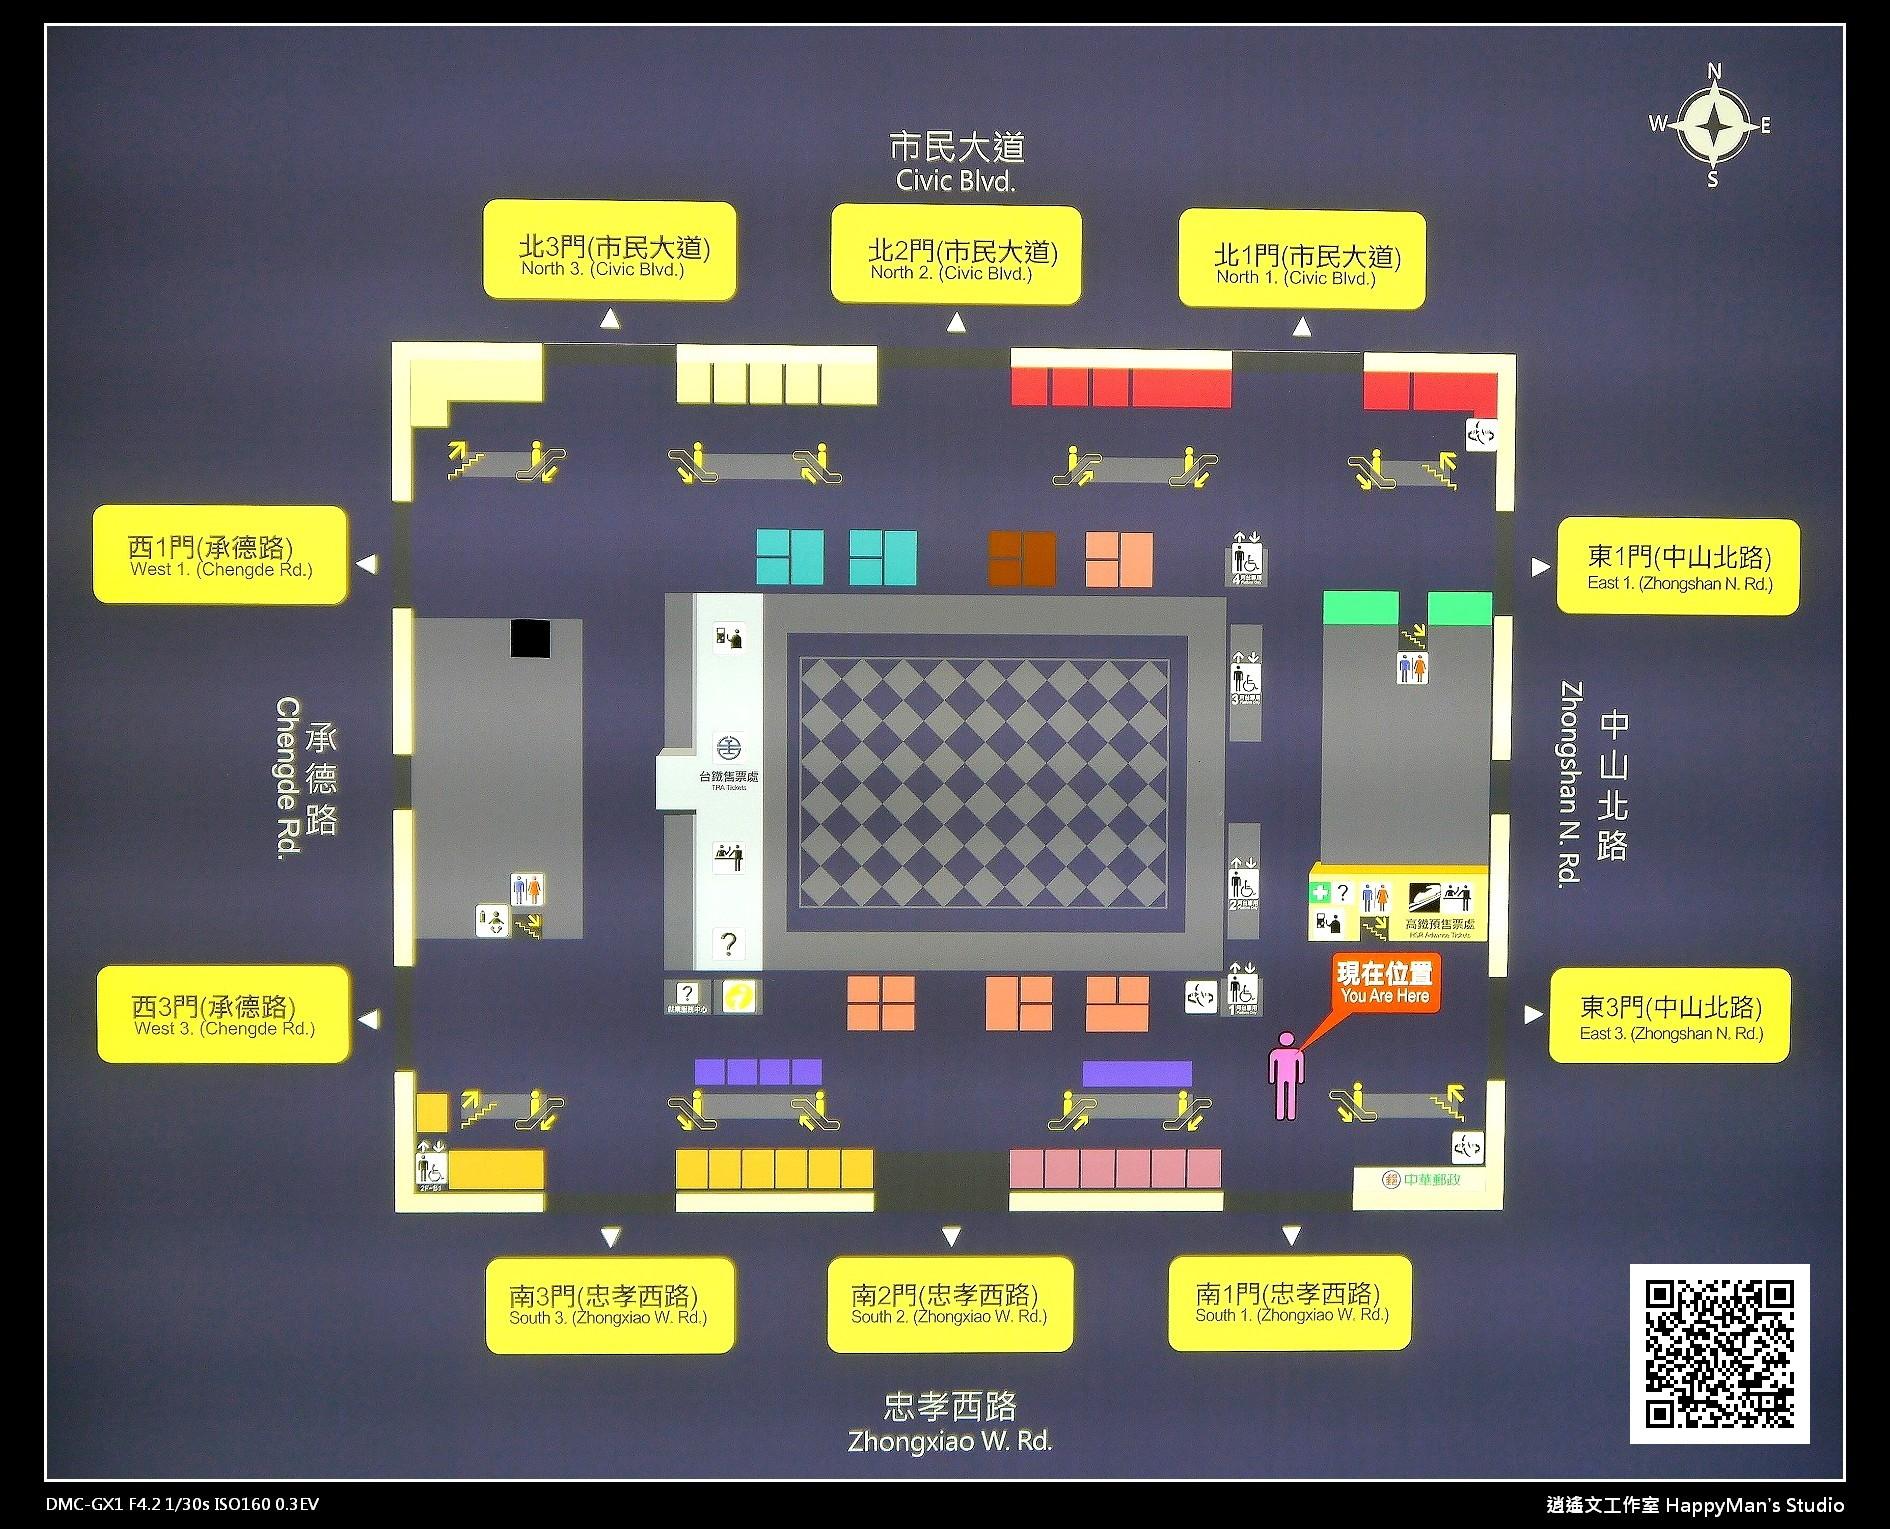 臺北車站平面圖 (Taipei Main Station Plan) | 逍遙文工作室